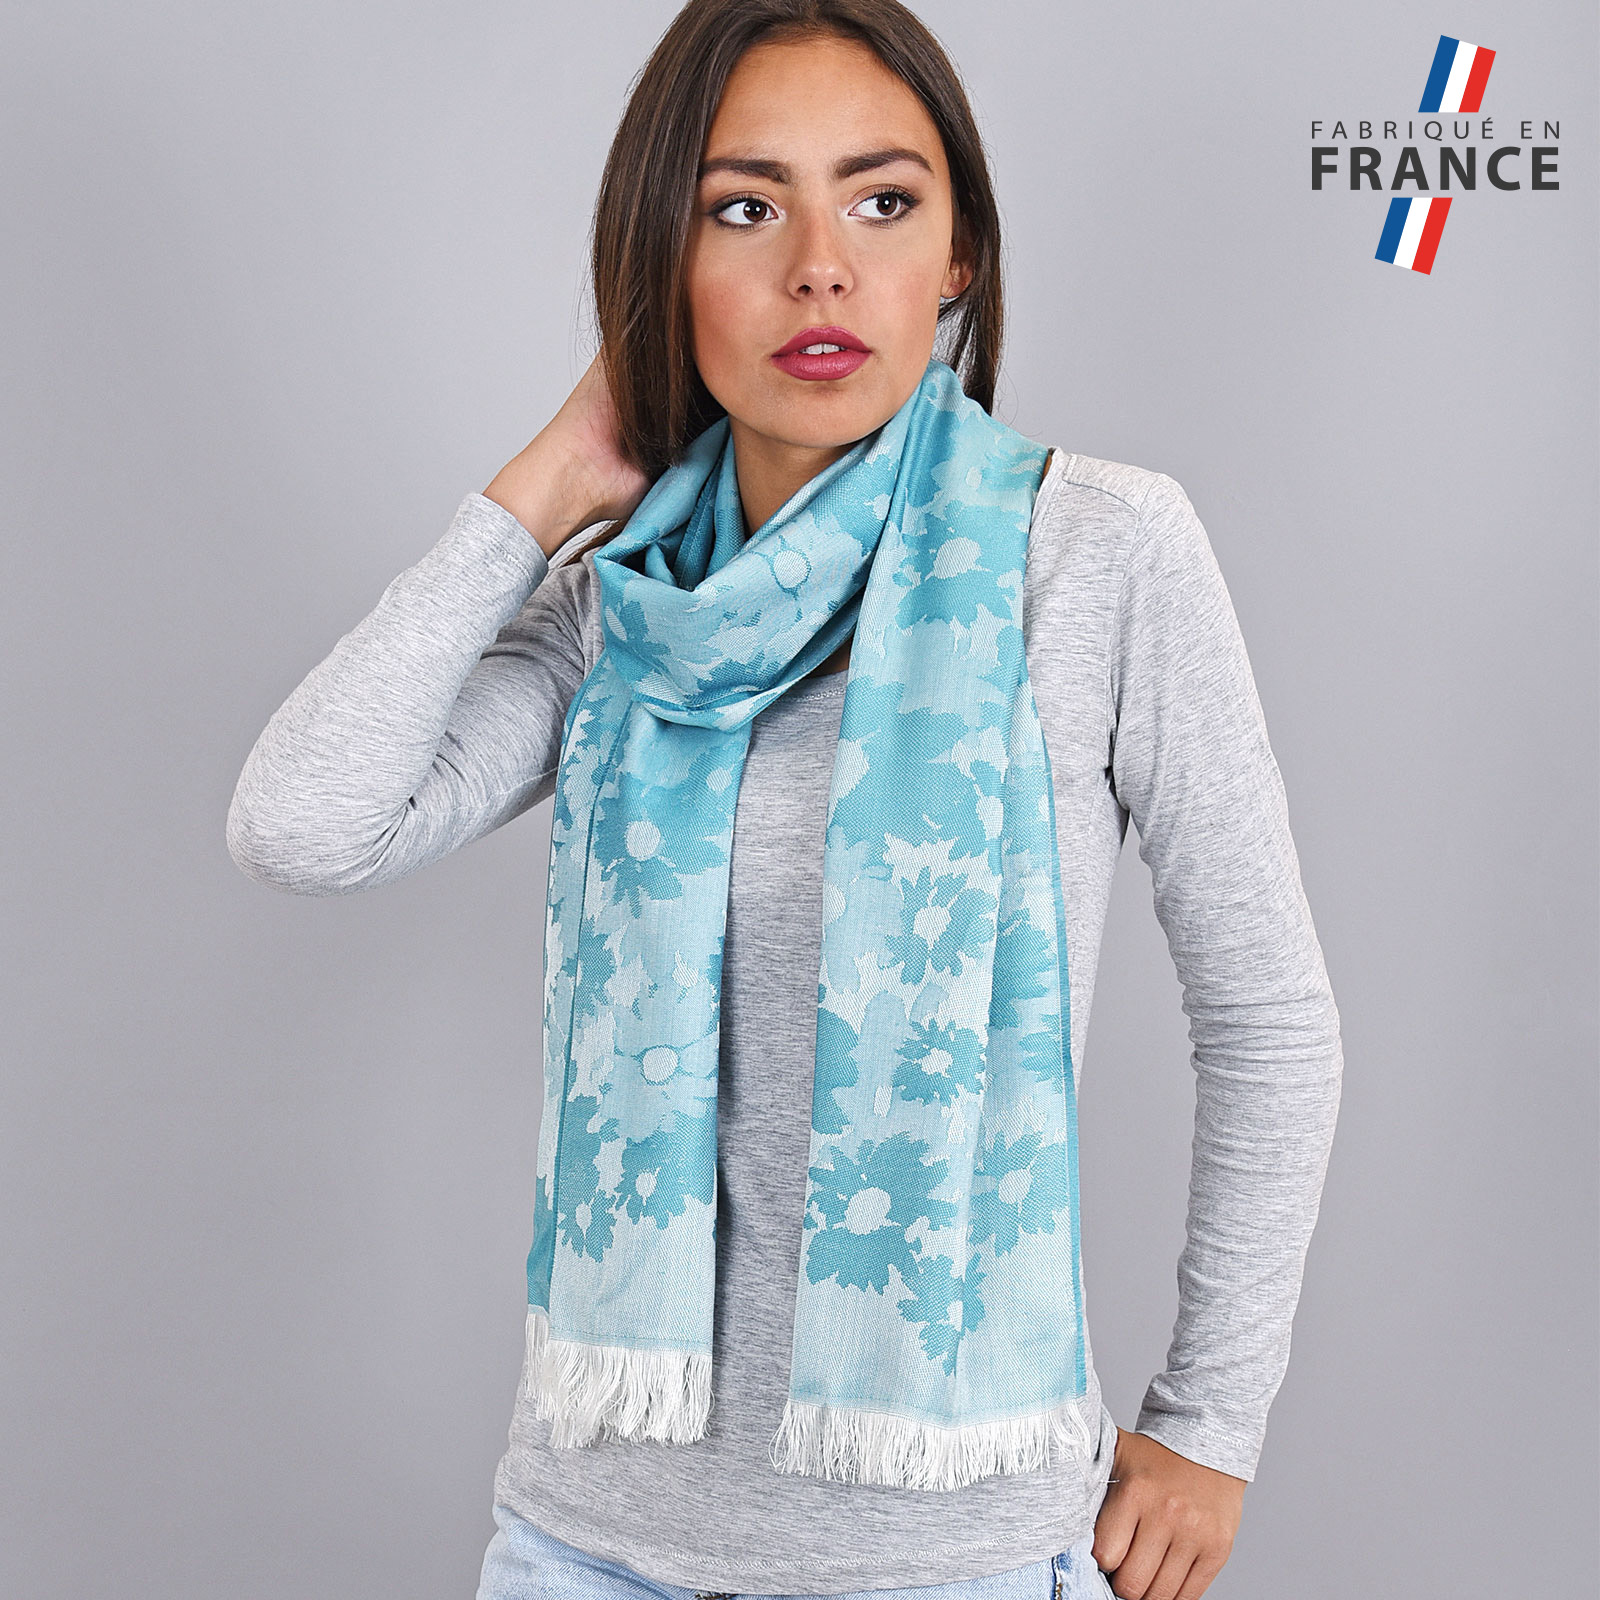 AT-03615-turquoise-VF16-LB_FR-echarpe-legere-fleurs-bleu-maya-fabrication-france